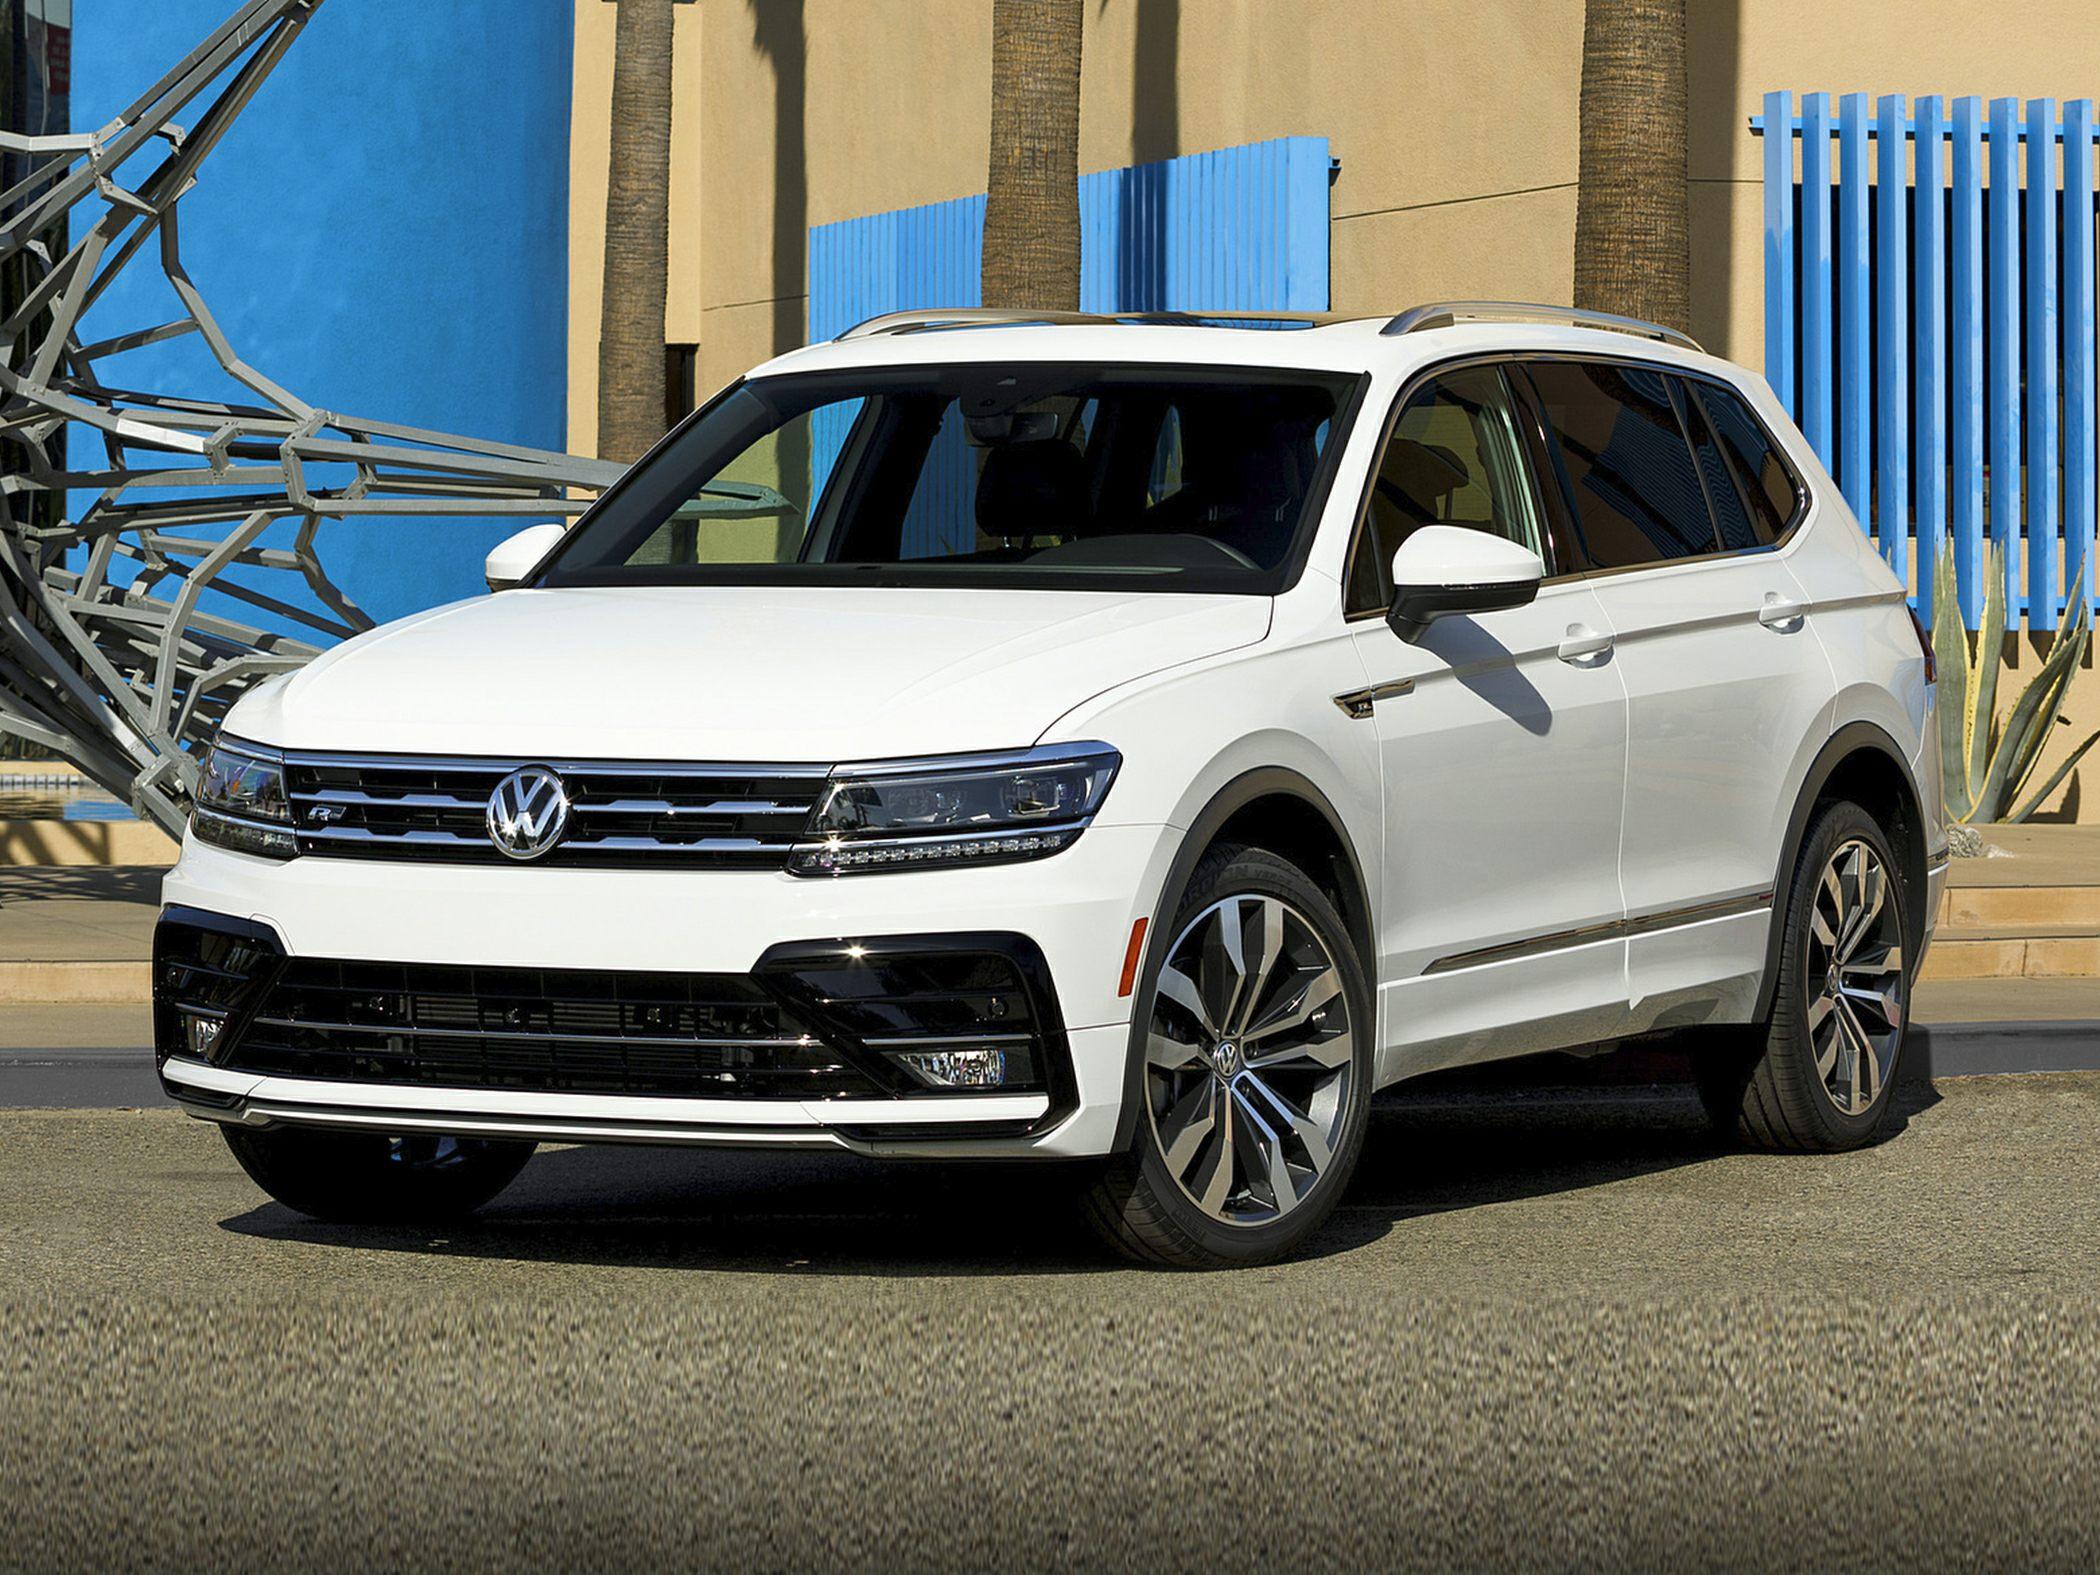 Great Deals on a new 2021 Volkswagen Tiguan 2.0T SE R-Line ...